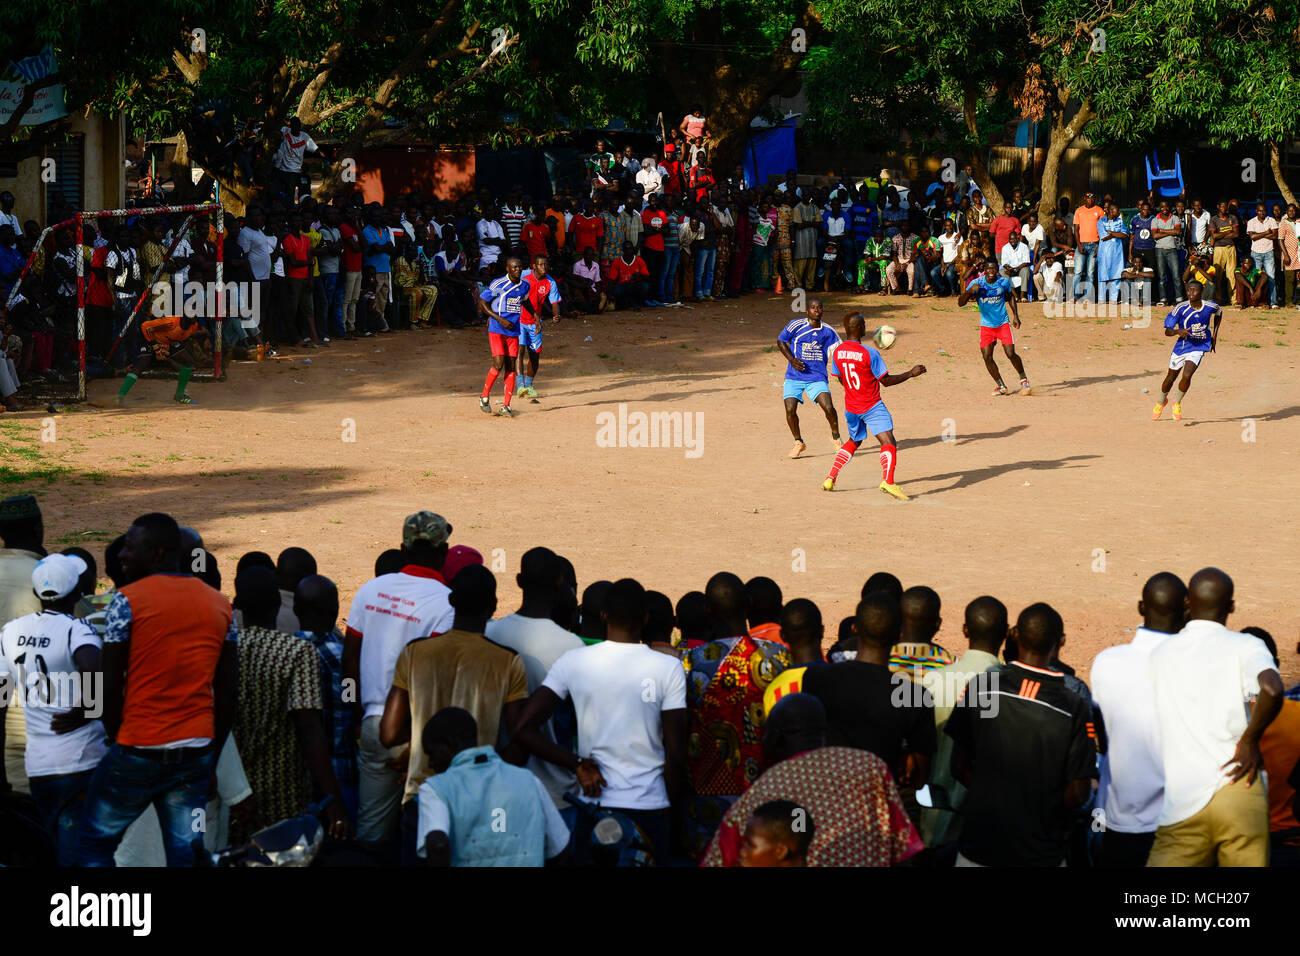 BURKINA FASO, Bobo Dioulasso, young people watch a soccer match / Jugendliche beim Fussballspiel - Stock Image